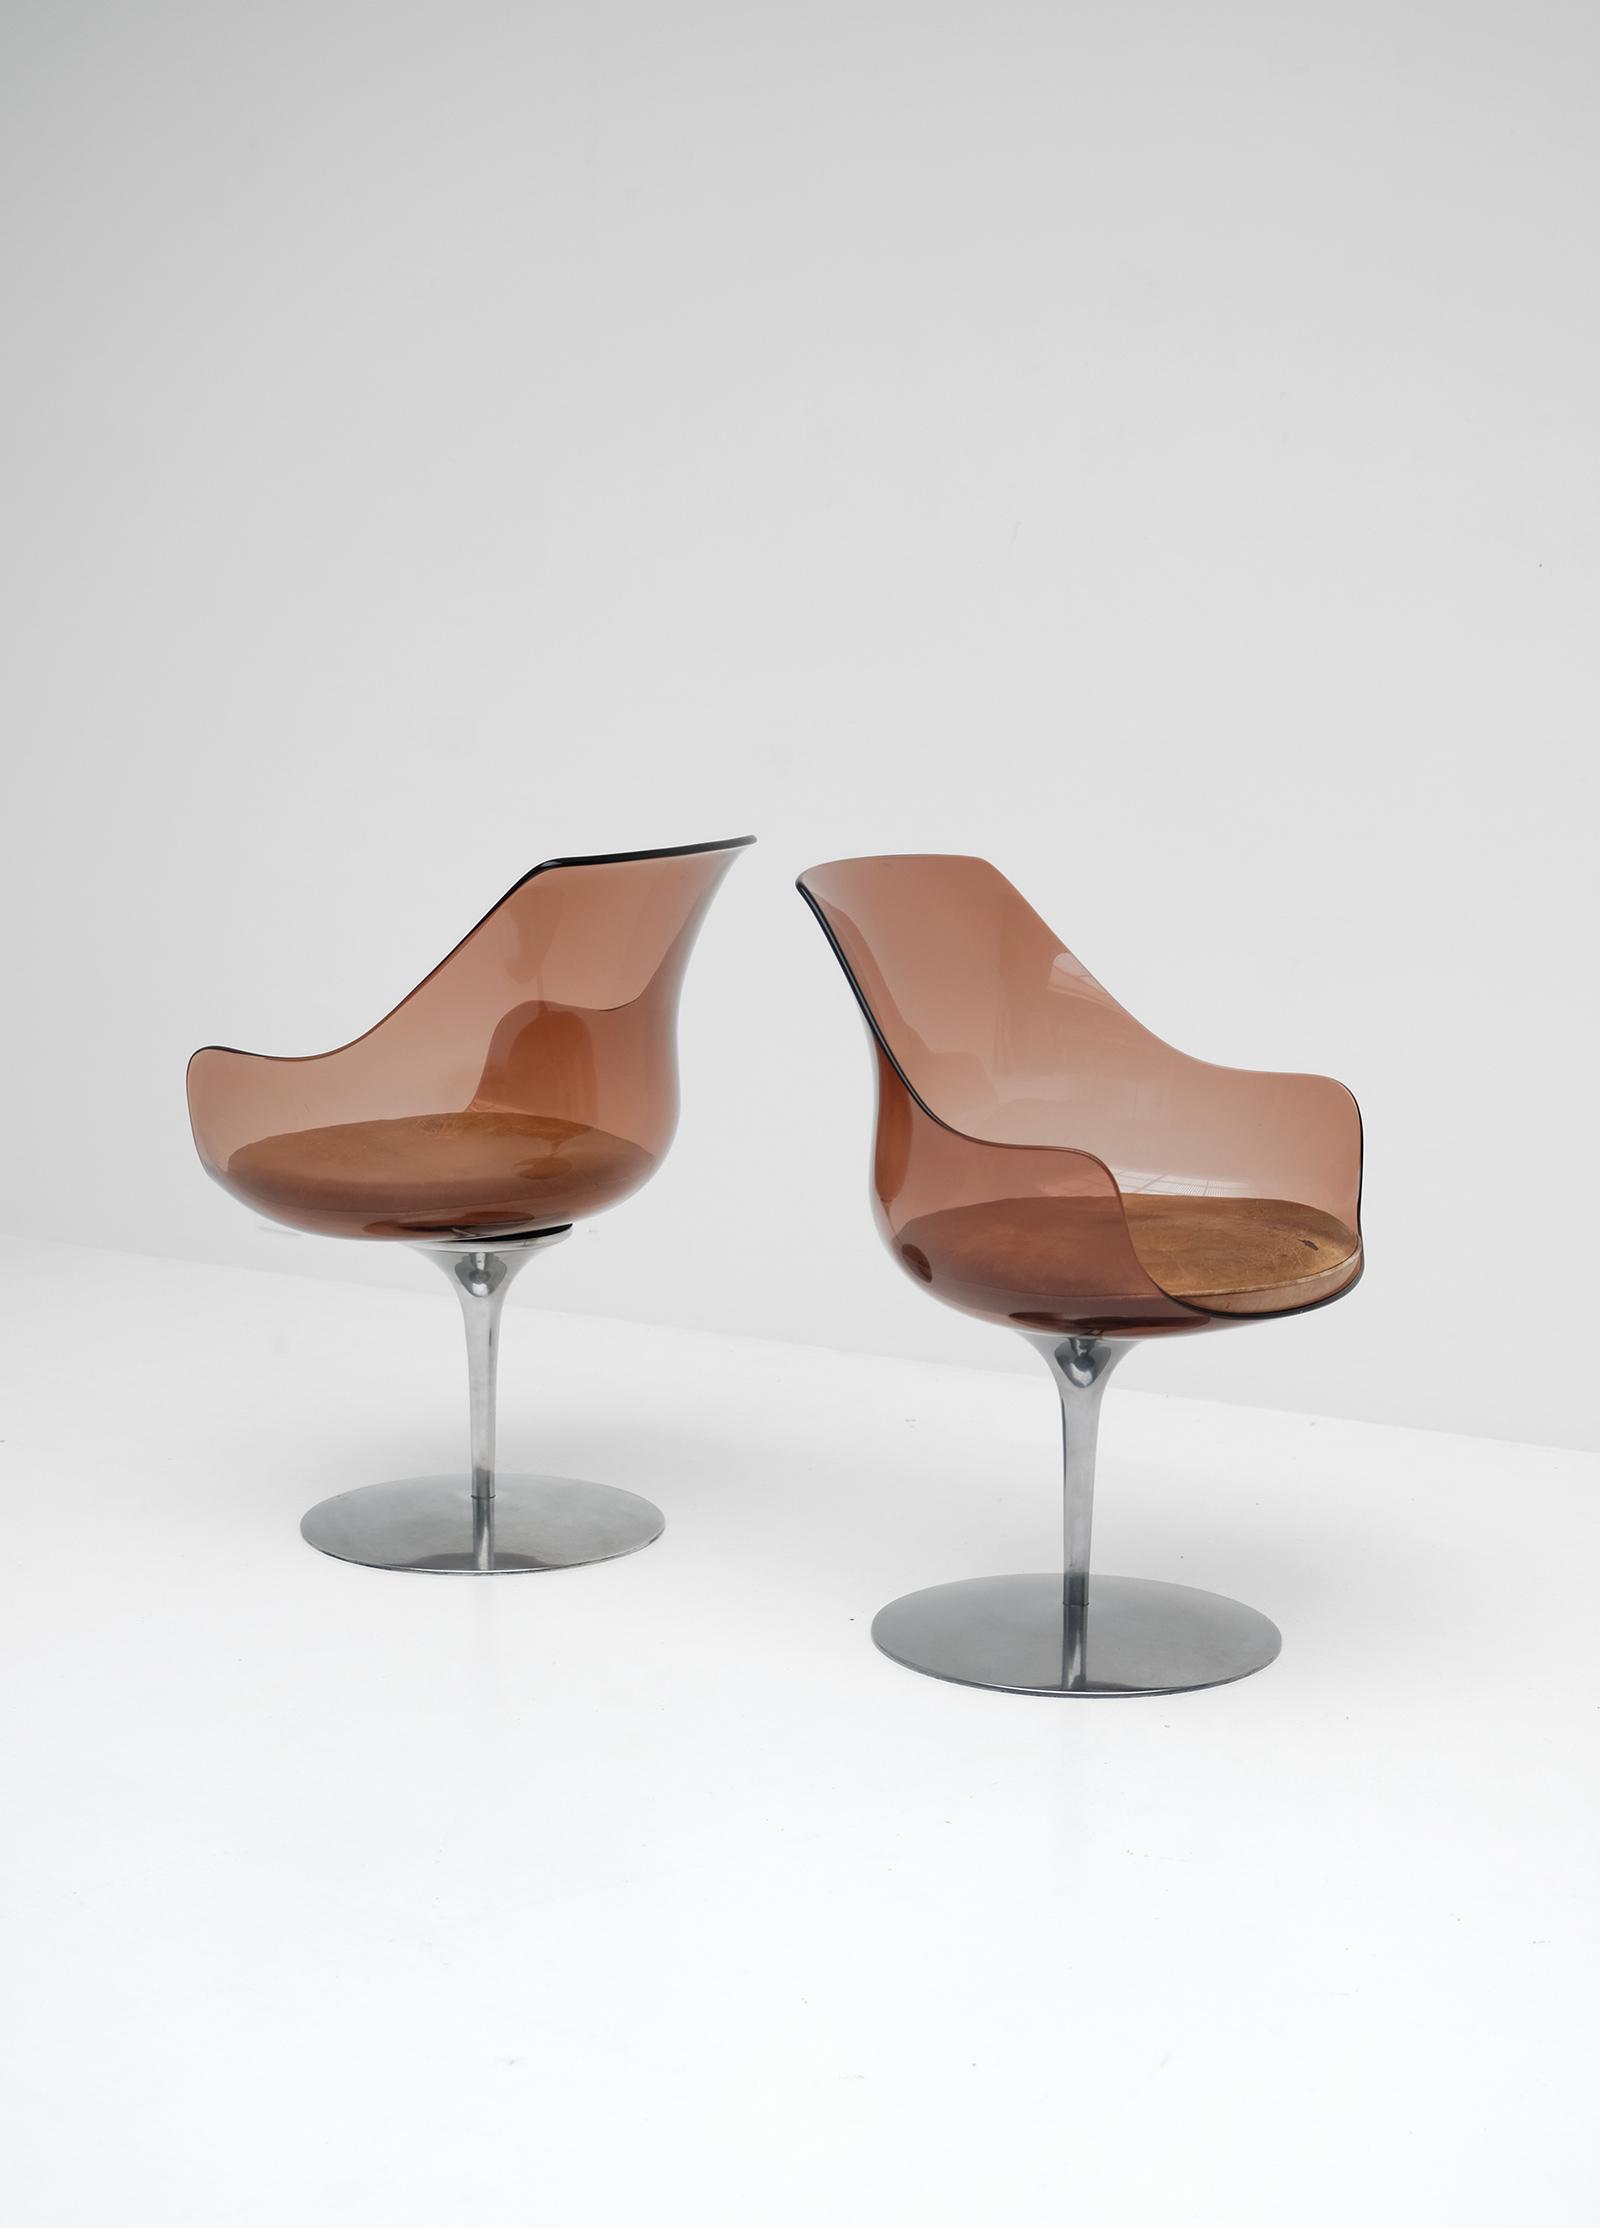 Laverne Champagne Chairs Formes Nouvellesimage 7